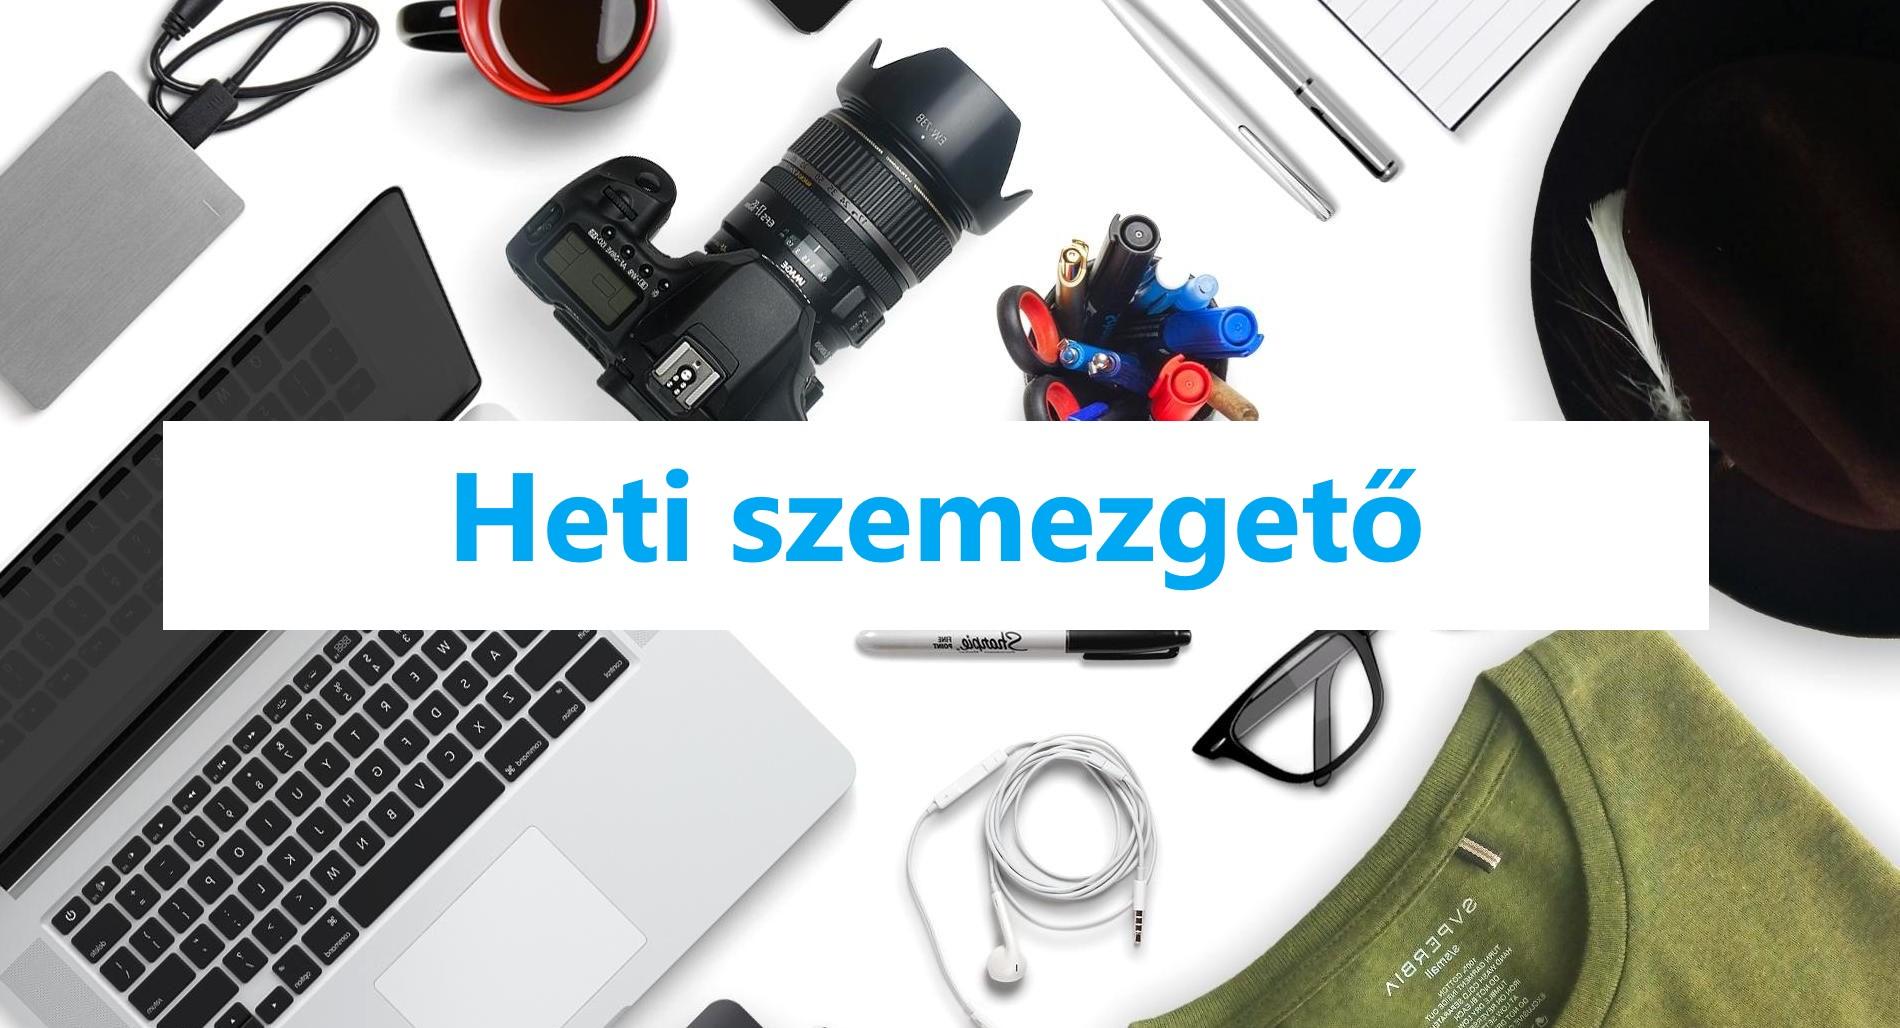 heti_szemezgeto_uj_67.jpg